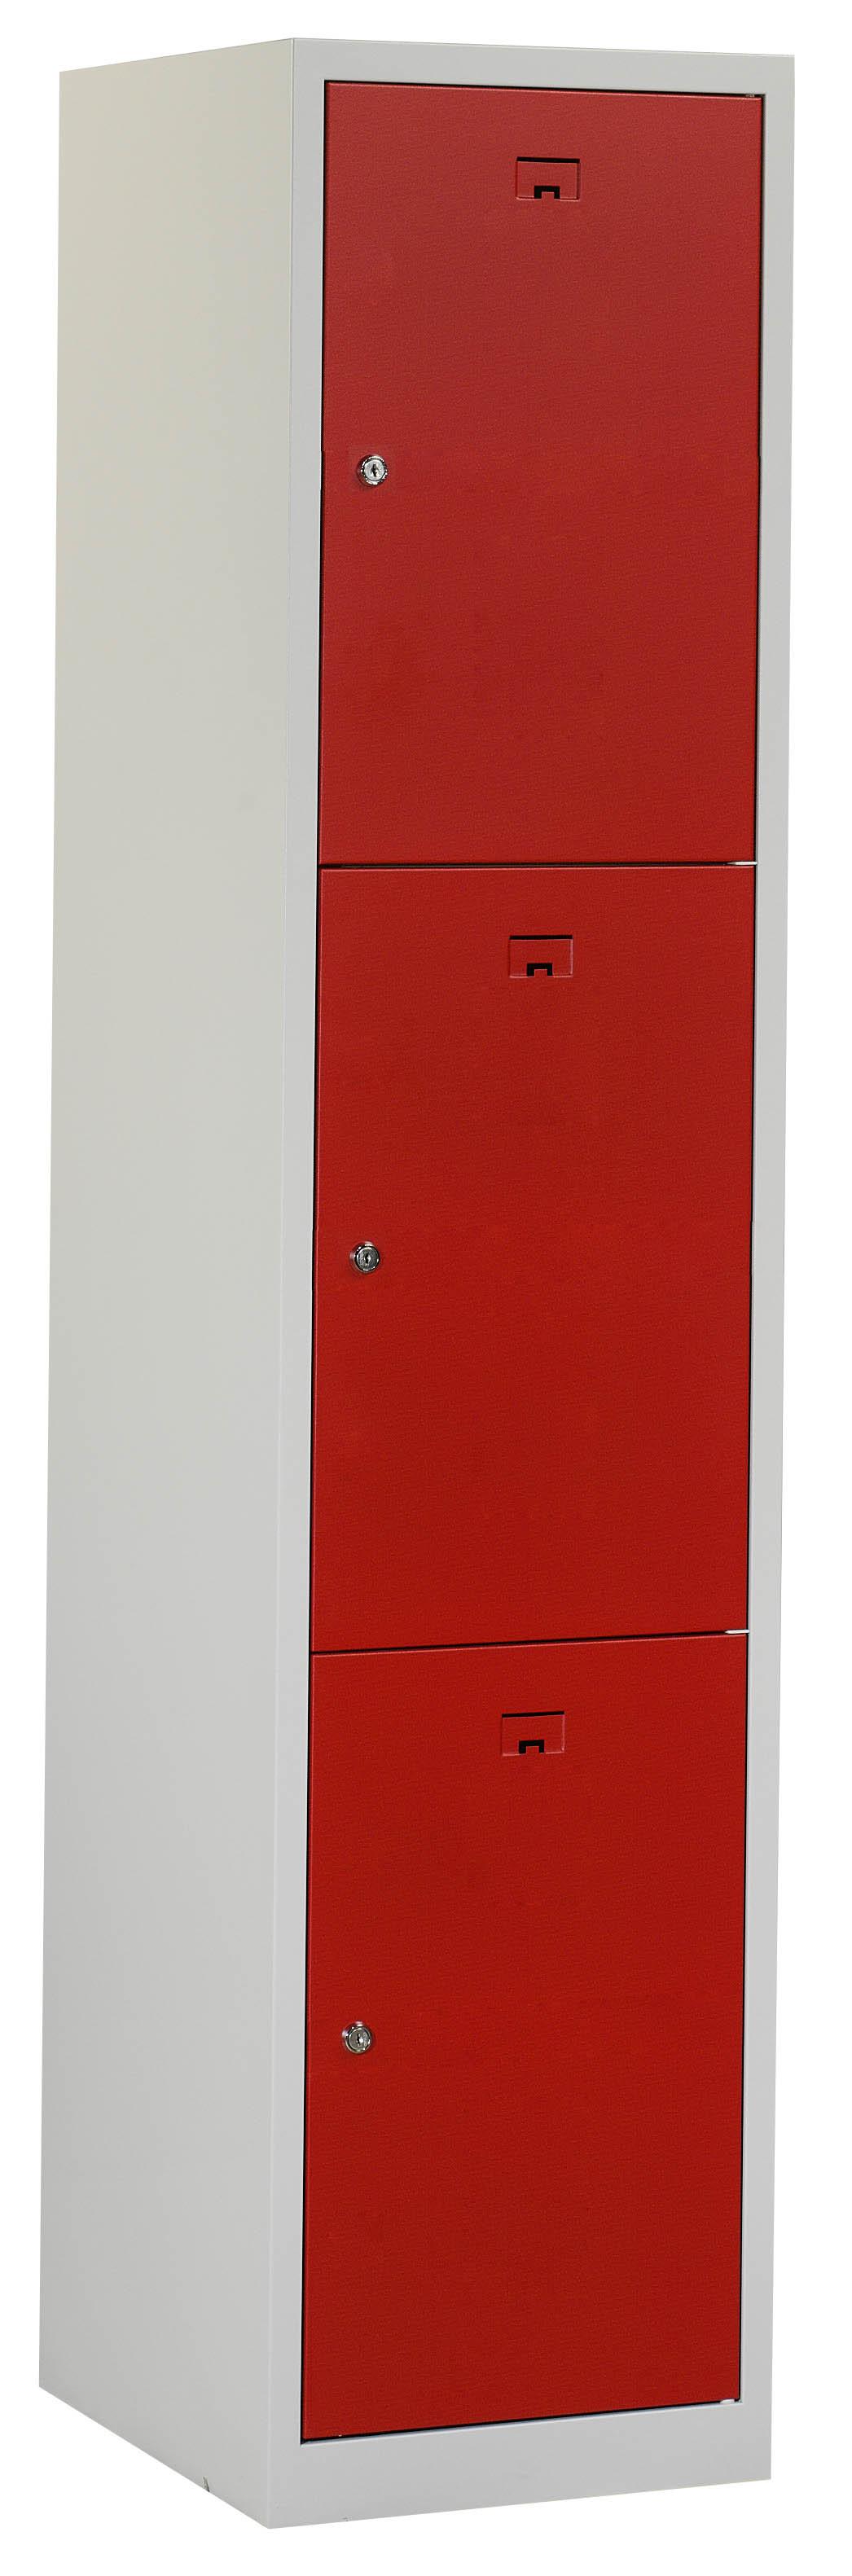 Flex Lockerkast 1x3-vaks (180x40x50cm)